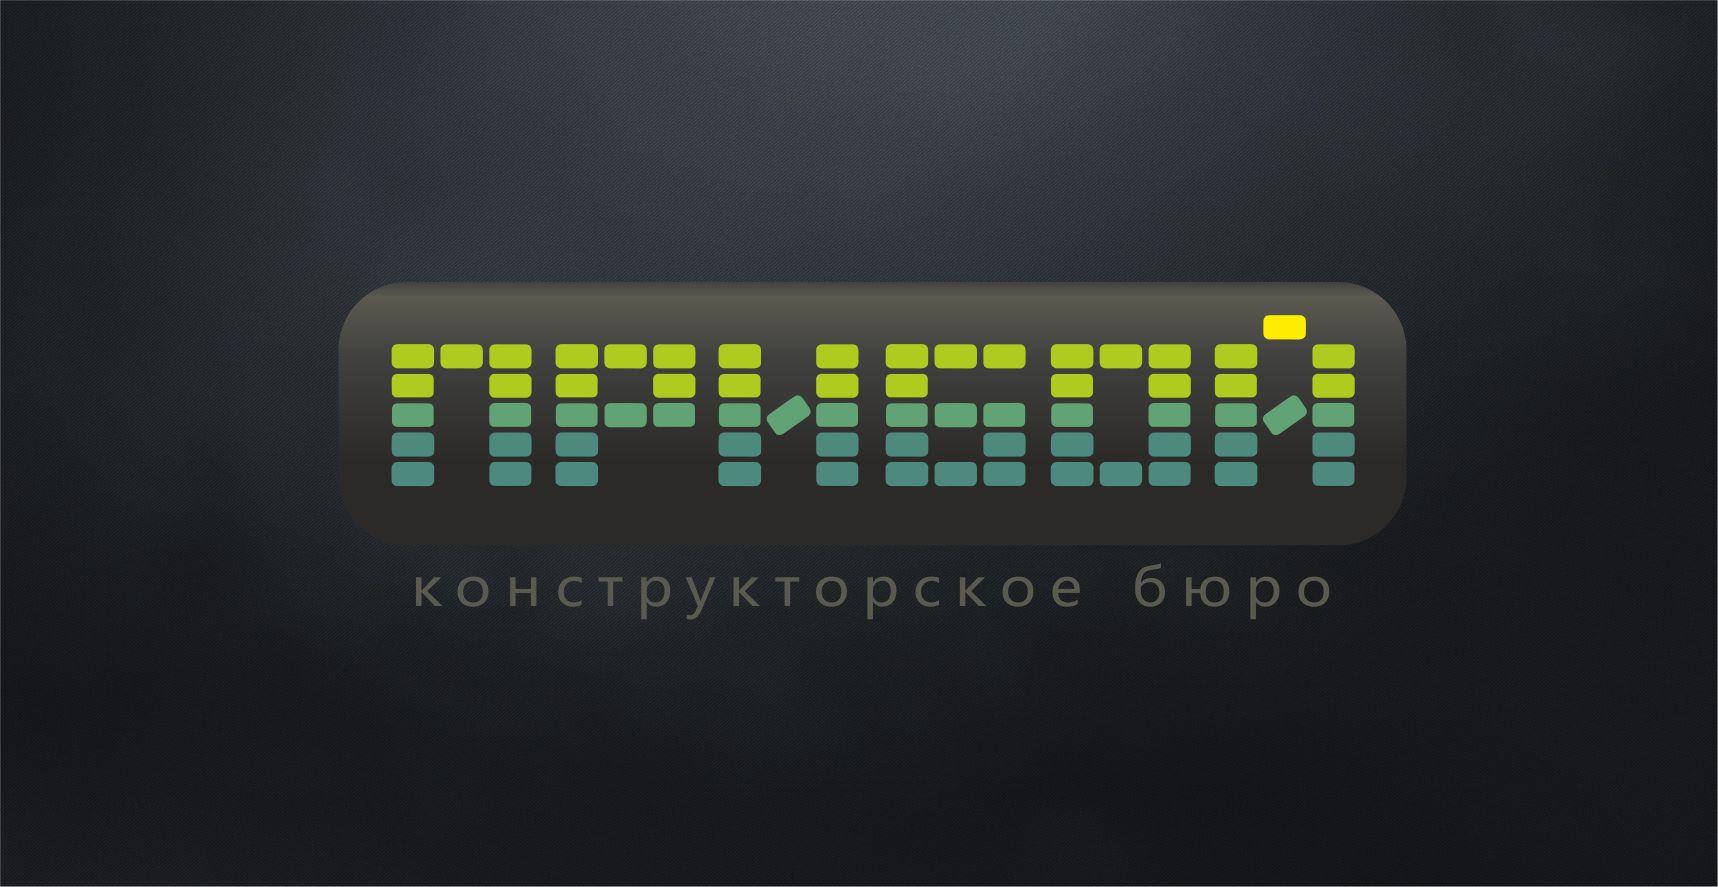 Разработка логотипа и фирменного стиля для КБ Прибой фото f_5395b2b933705823.jpg